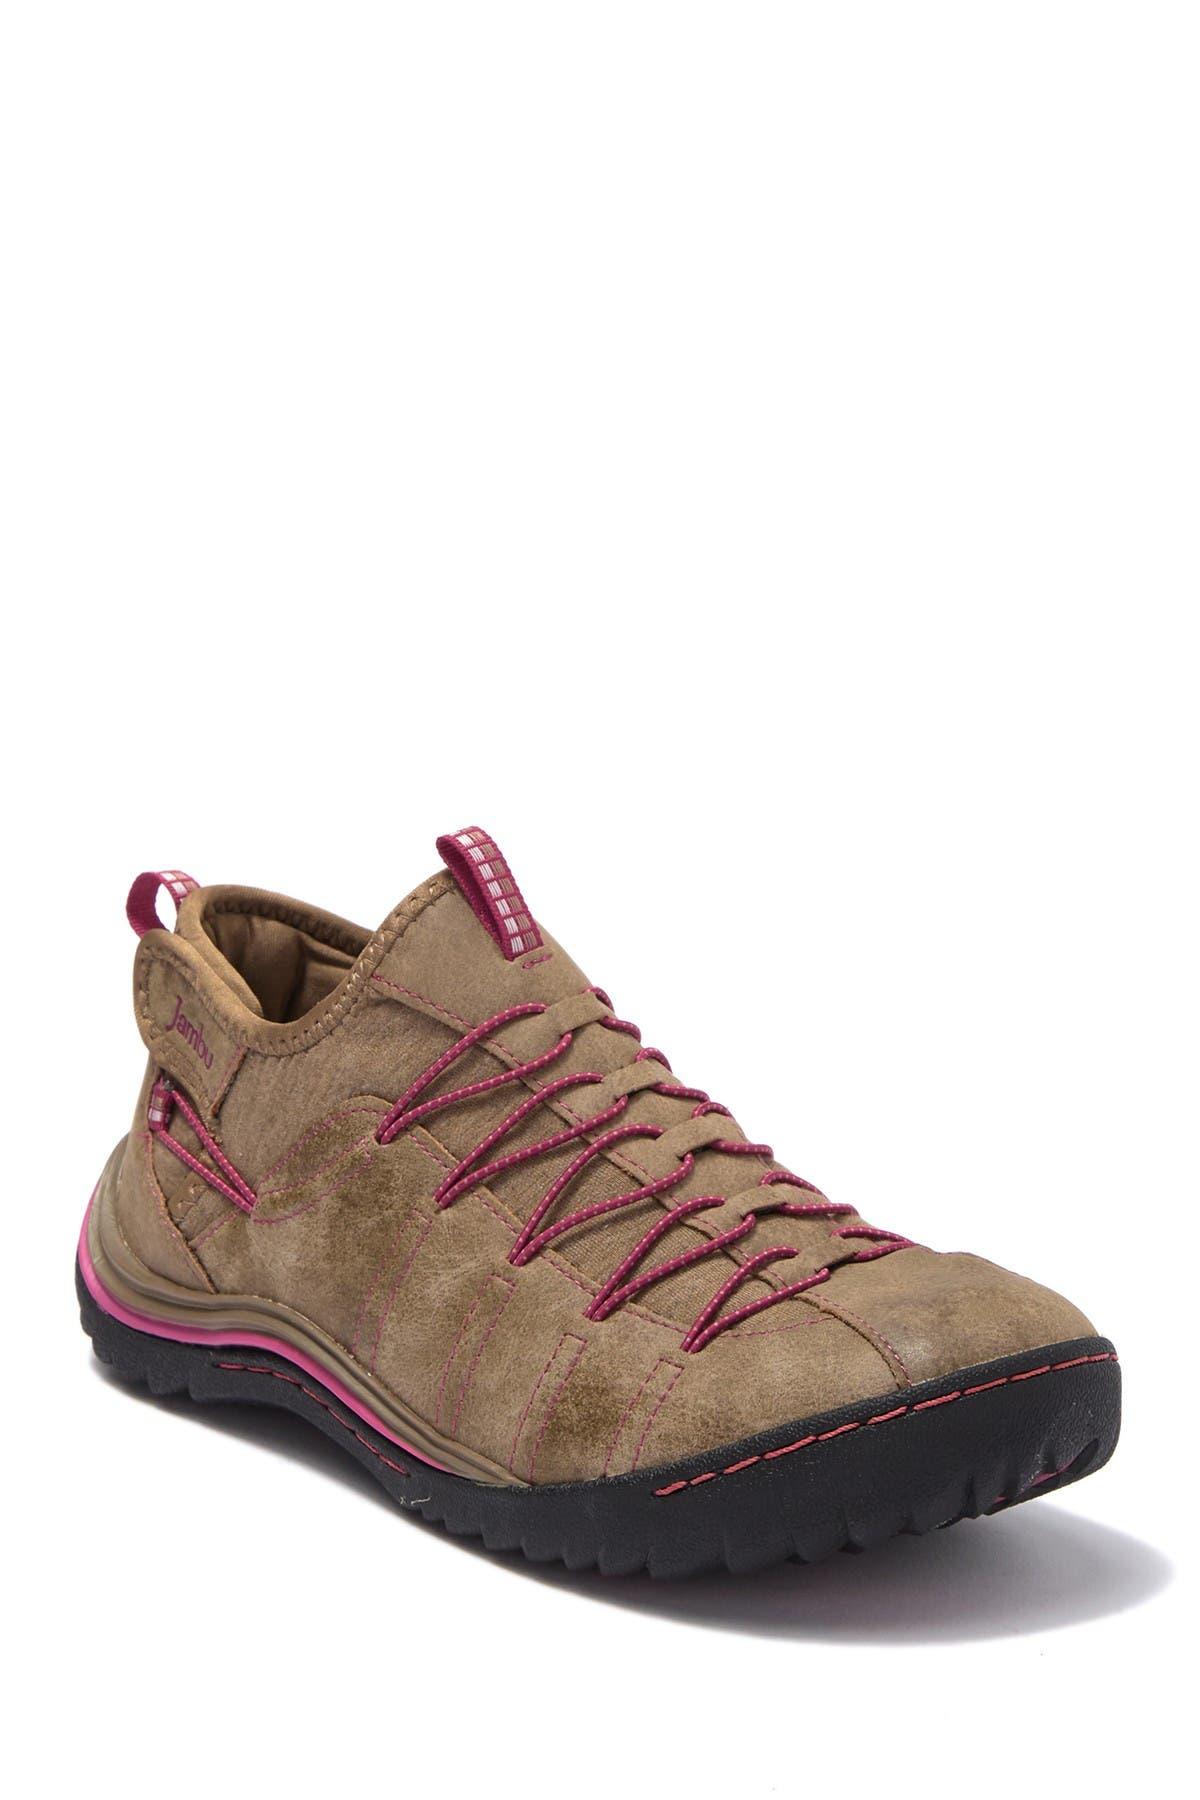 Jambu   Spirit Sneaker - Wide Width